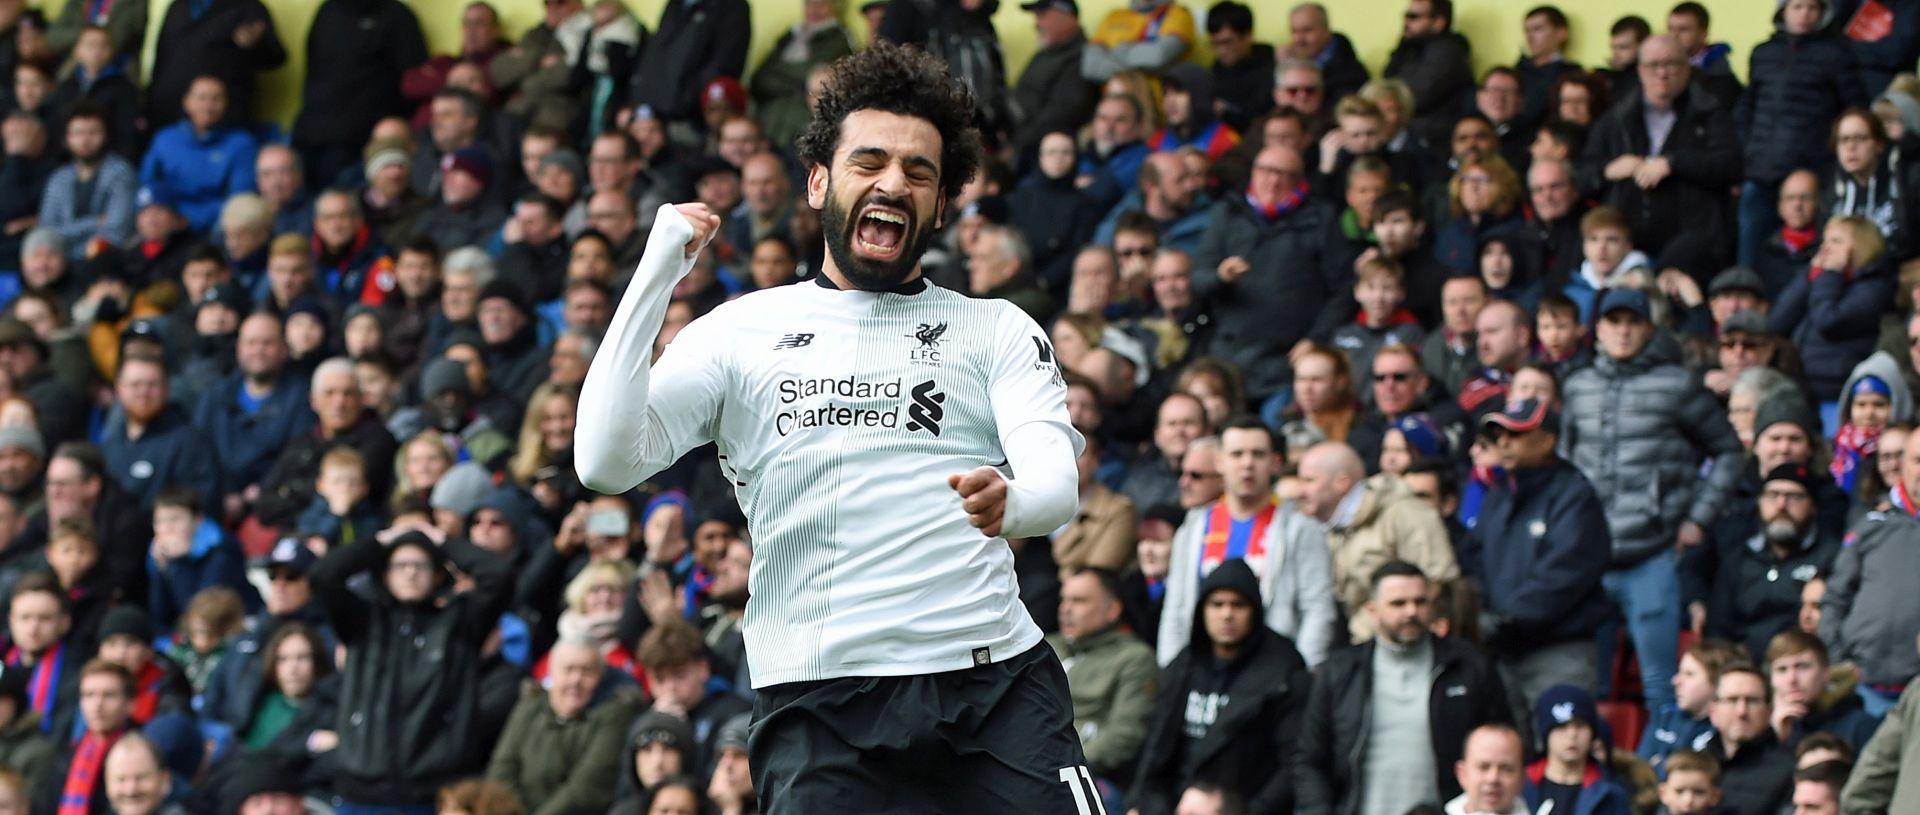 Salah proglašen najboljim nogometašem sezone